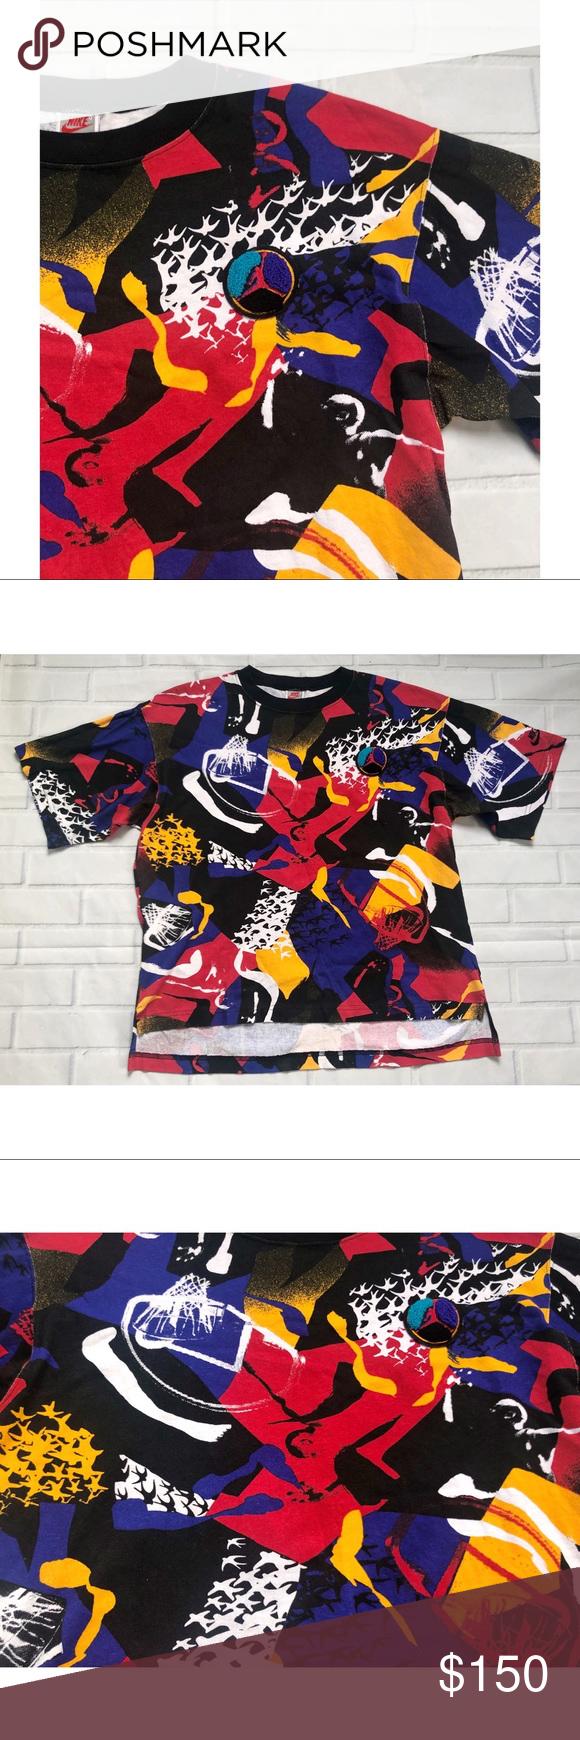 e547d5a1f500dd Black Red And Purple Jordan Shirt - DREAMWORKS